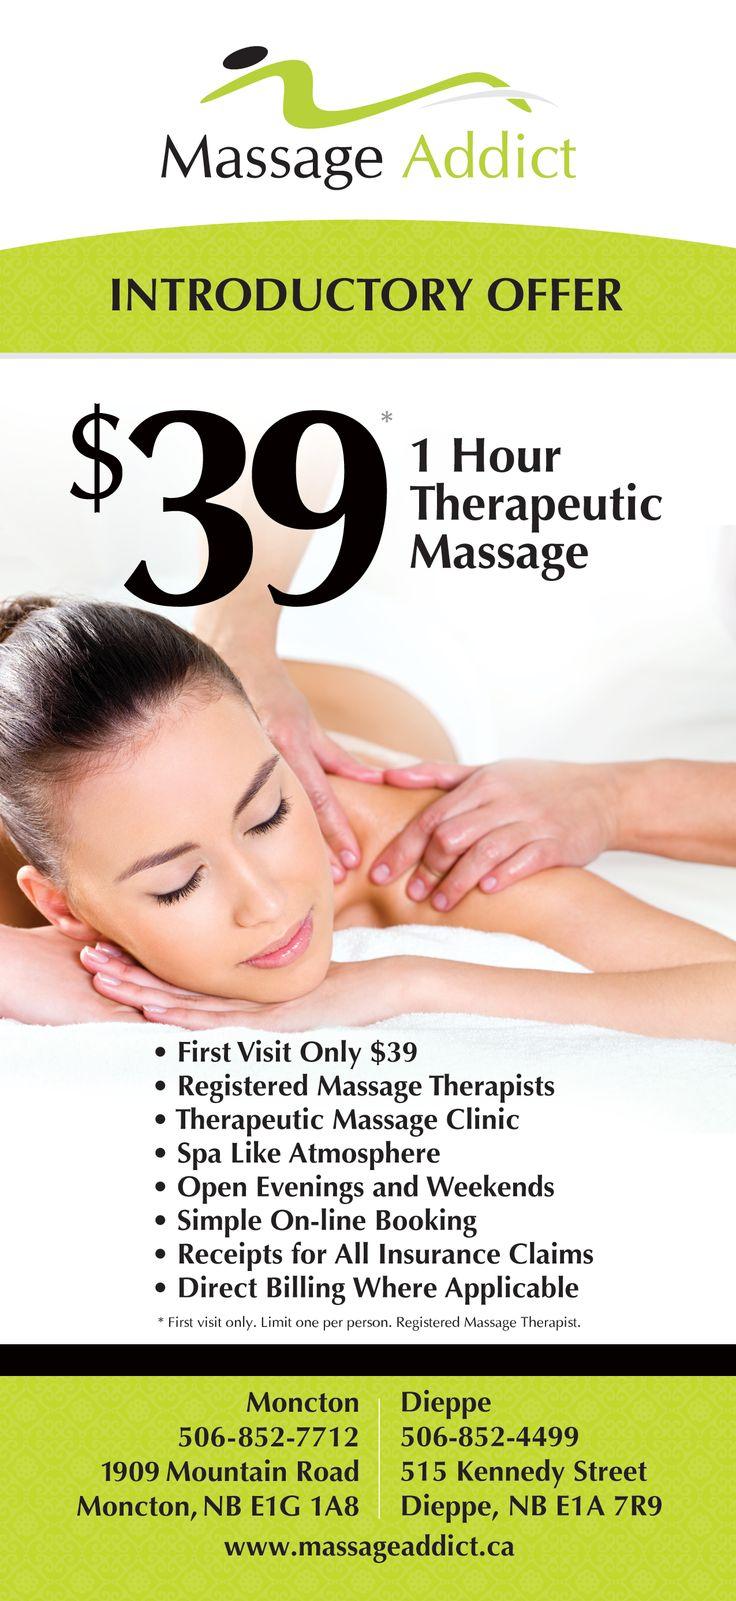 Massage Addict - Moncton & Dieppe Introductory Offer Rack Card  Design: Gino Caron